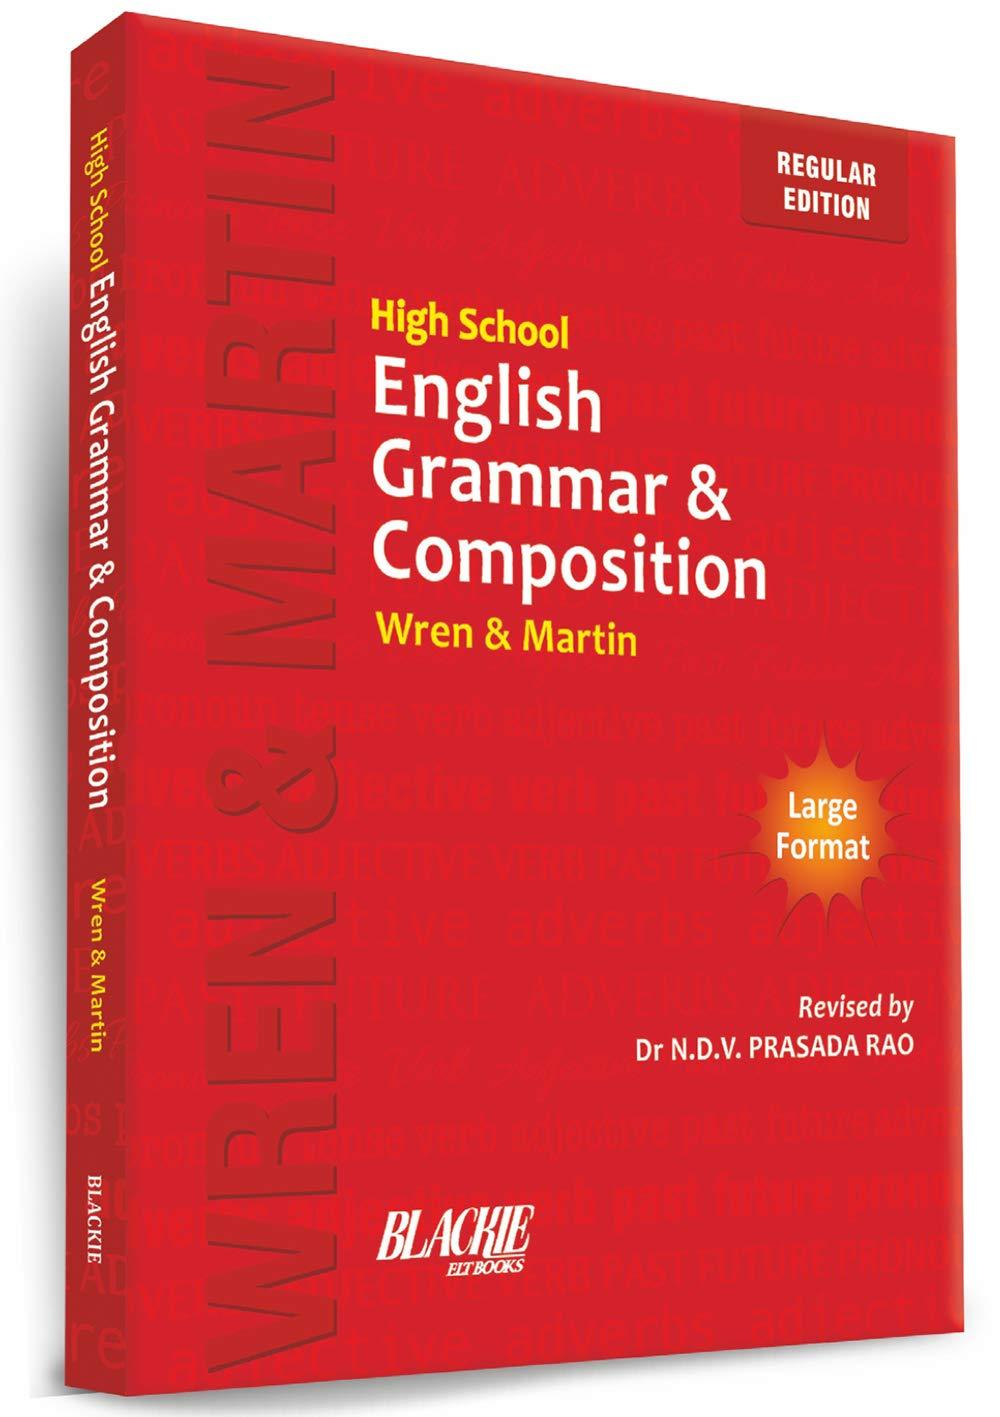 Literature For Composition 11th Edition Pdf